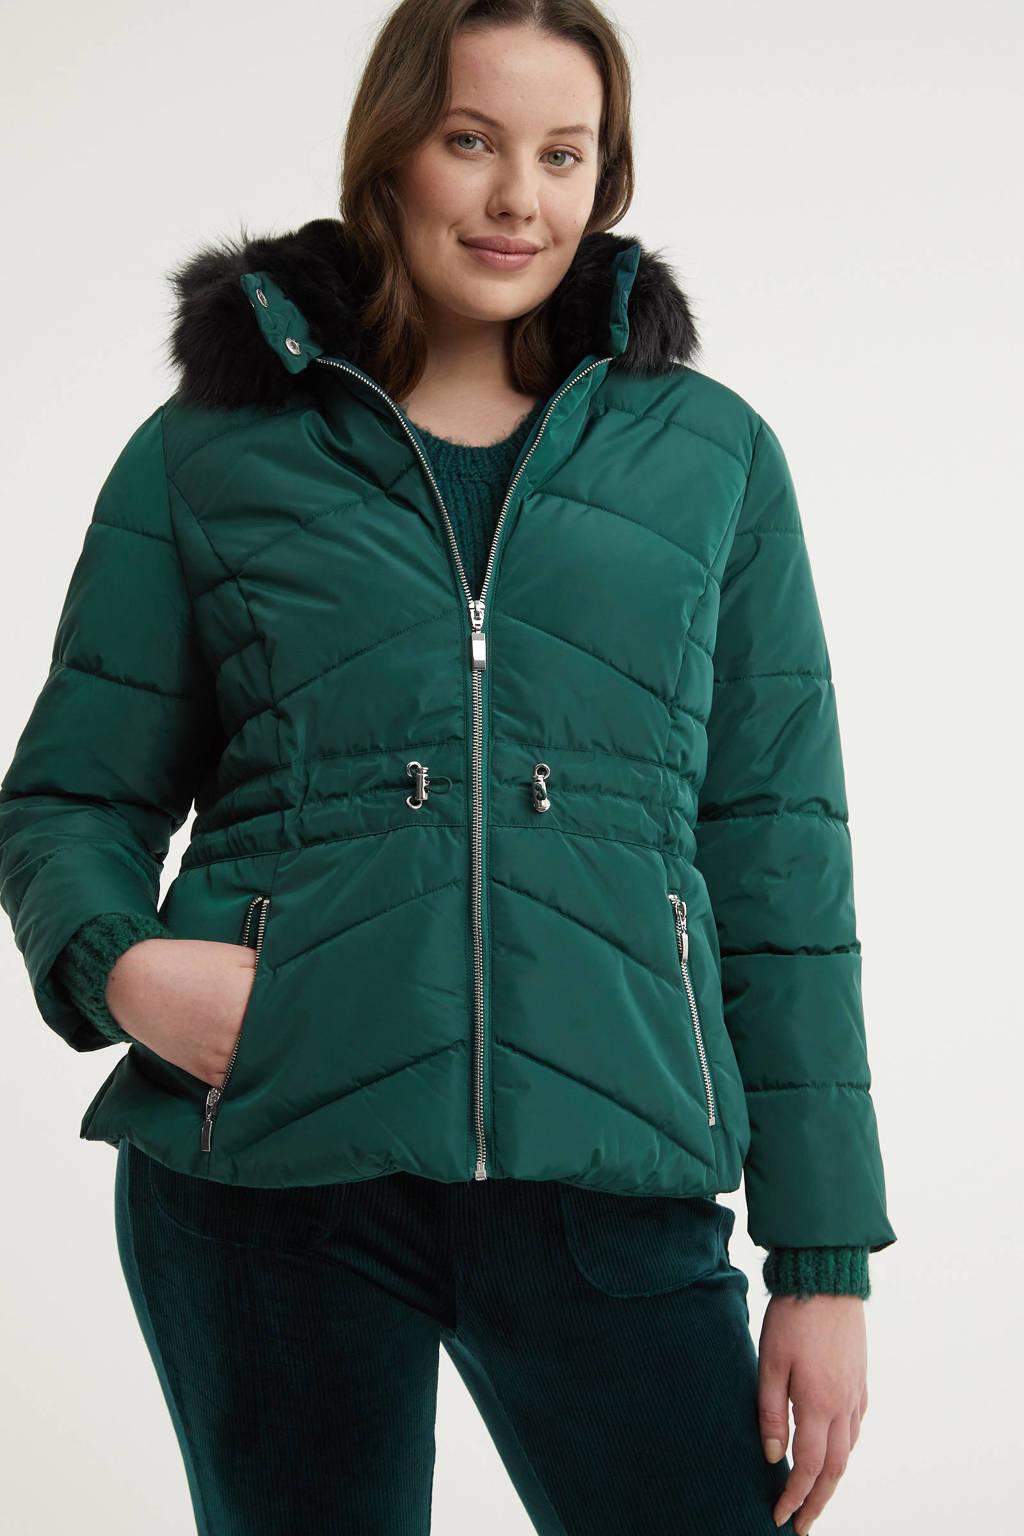 Simply Be gewatteerde jas donkergroen/zwart, Donkergroen/zwart